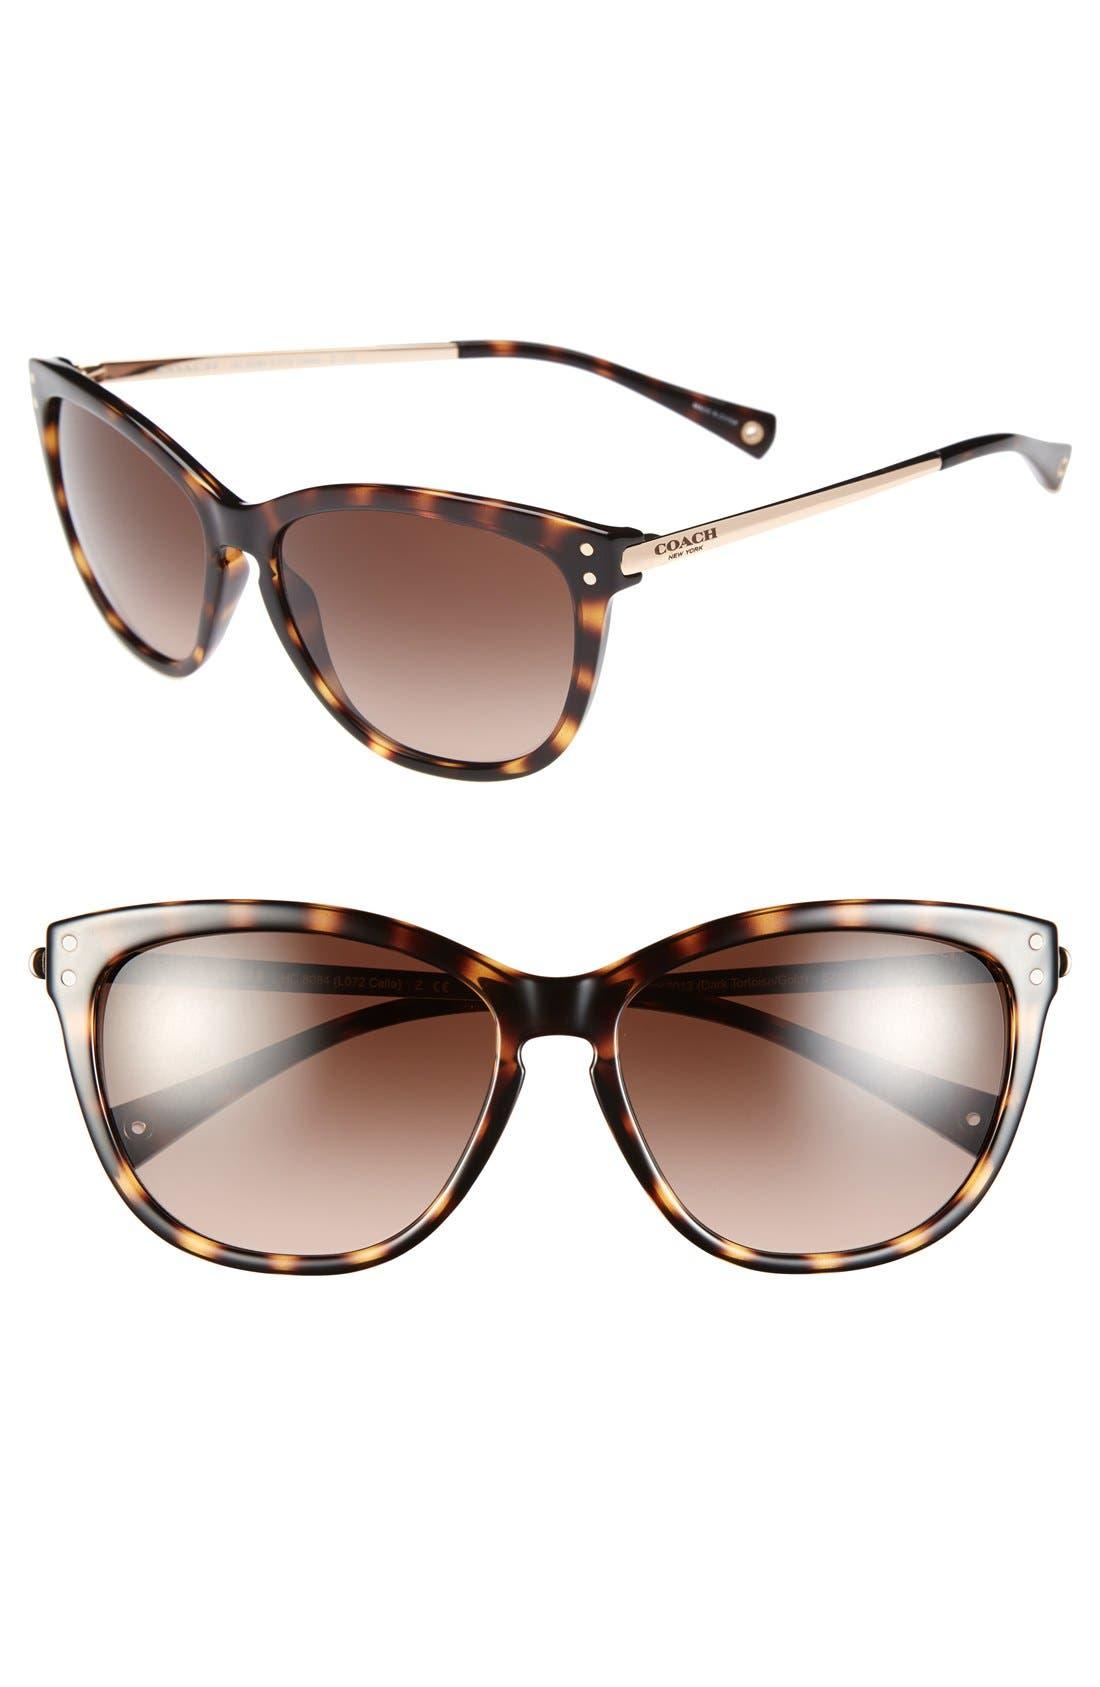 Main Image - COACH 'Celia' 57mm Cat Eye Sunglasses